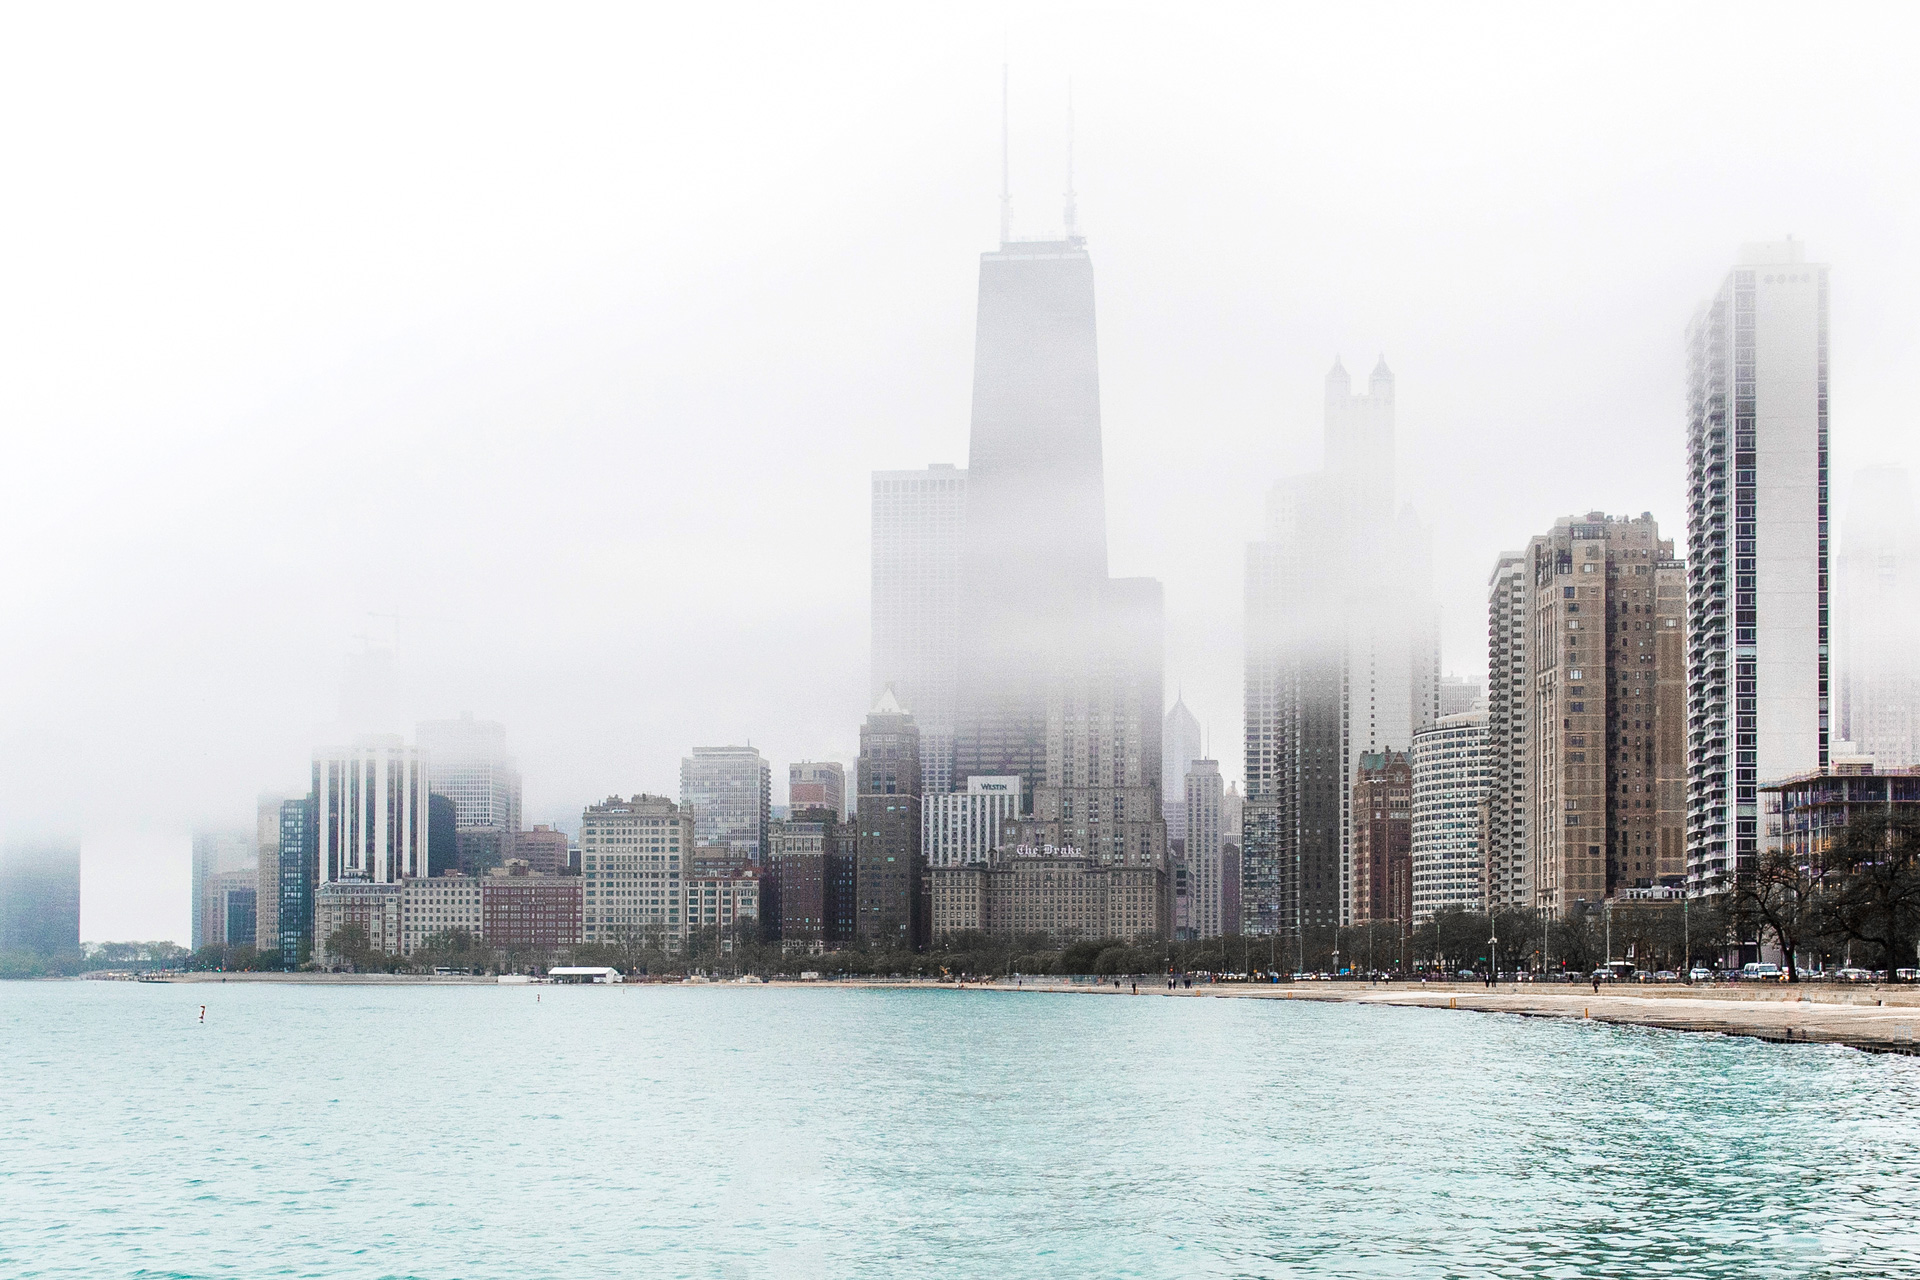 Stopover: Chicago